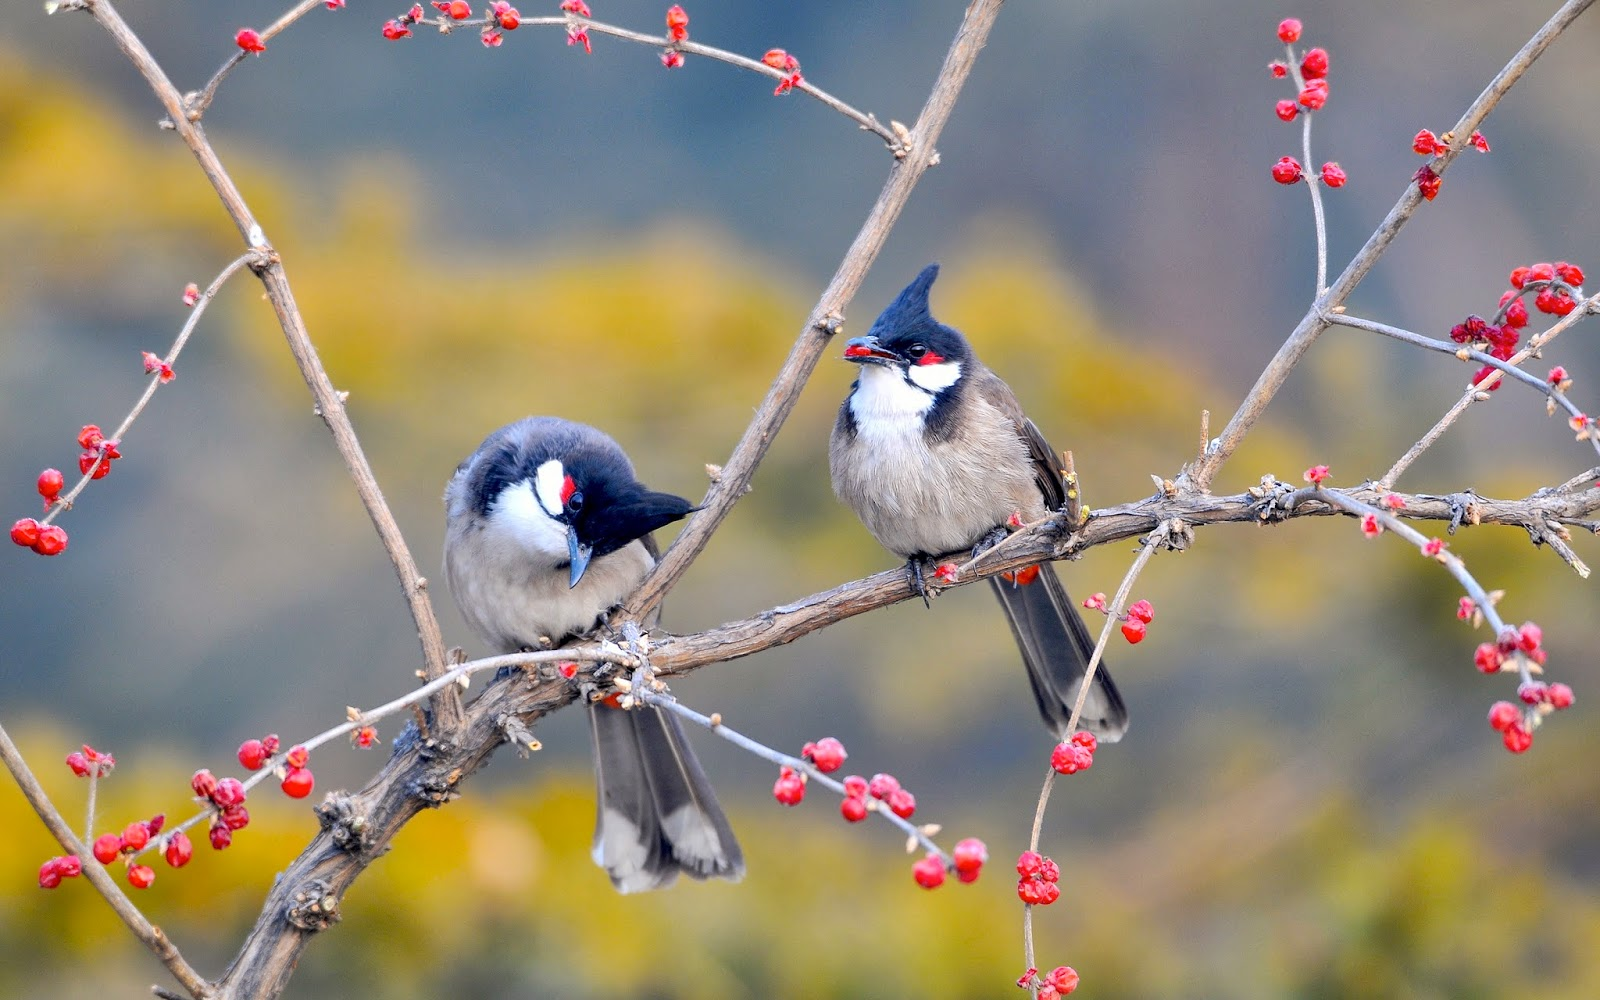 Aves de Bulbul de arbusto rojo